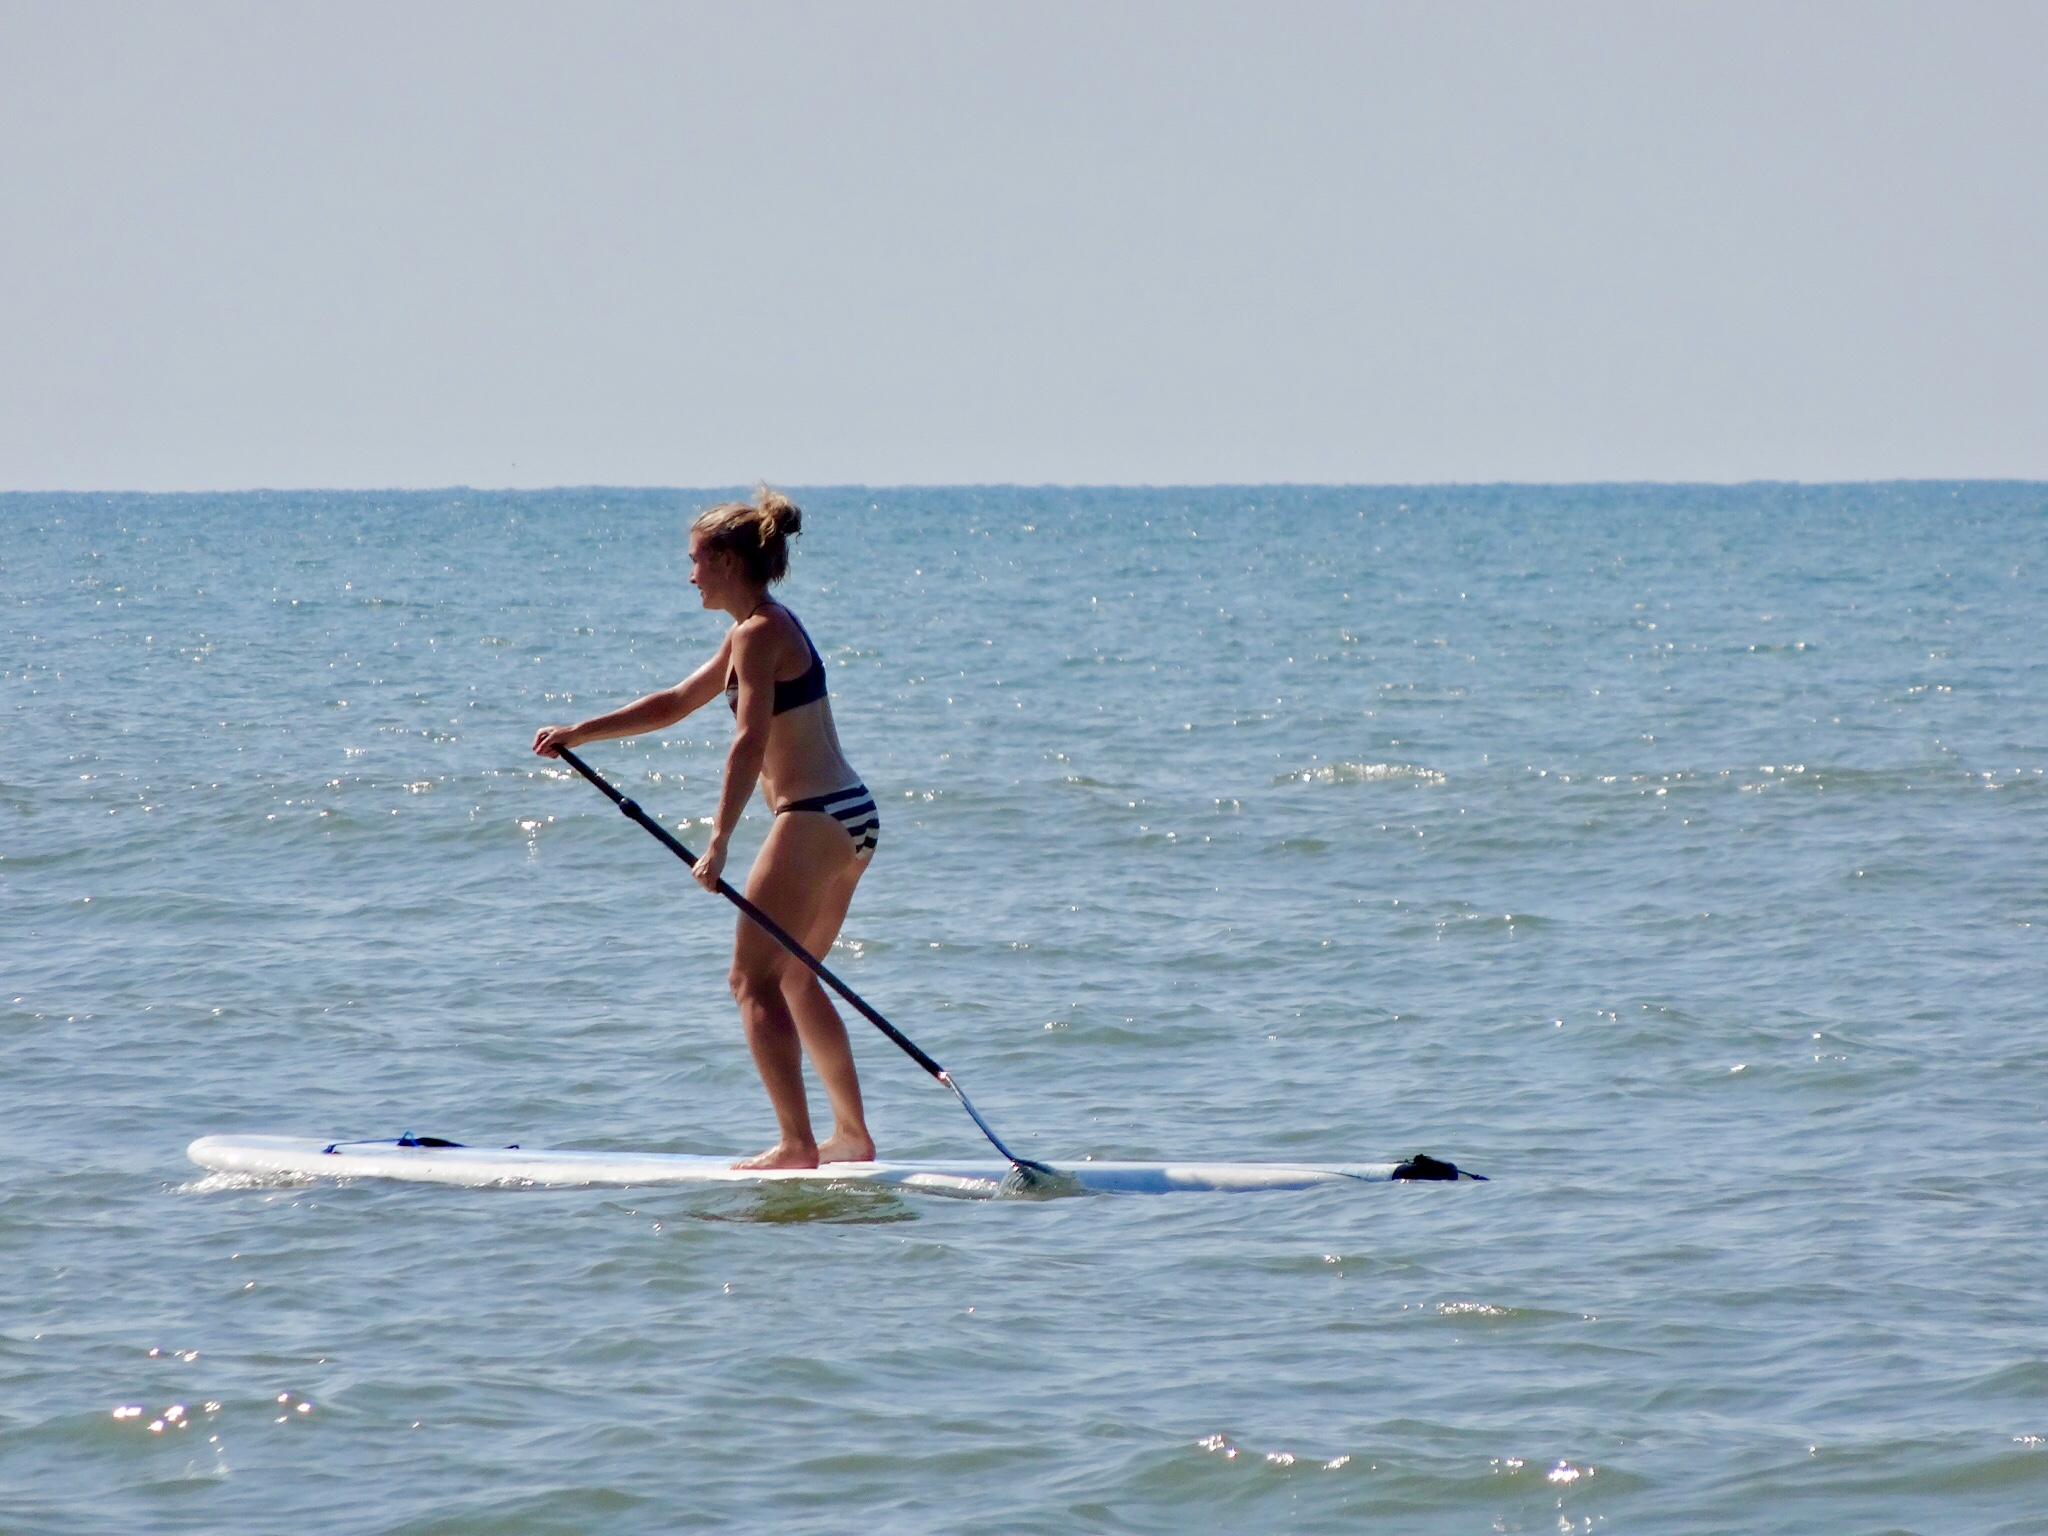 Paddling in the Atlantic Ocean